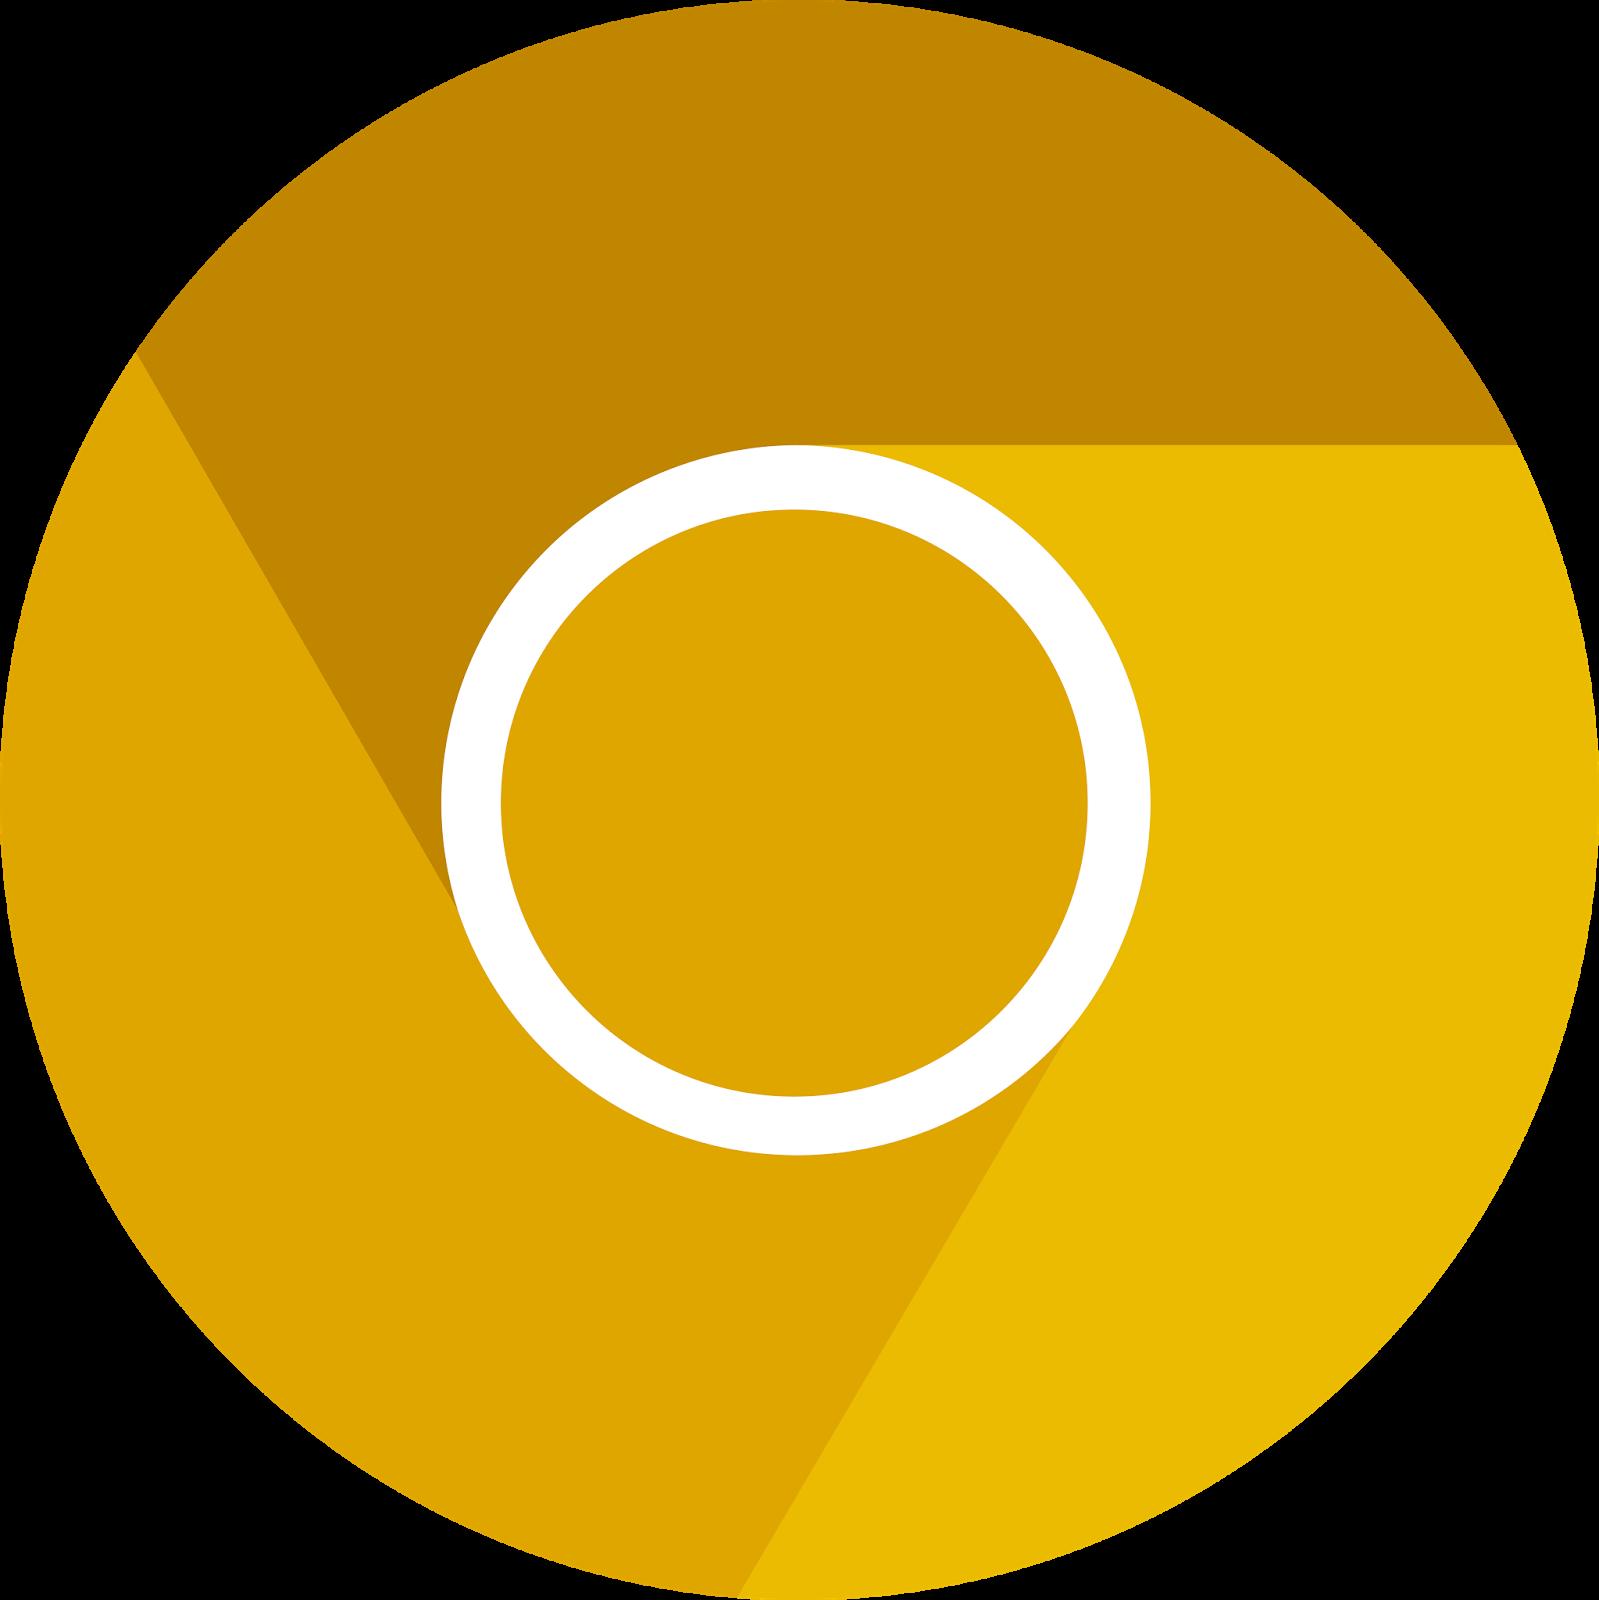 Flat Google Chrome, Google Chrome Canary Vectors - extramaster